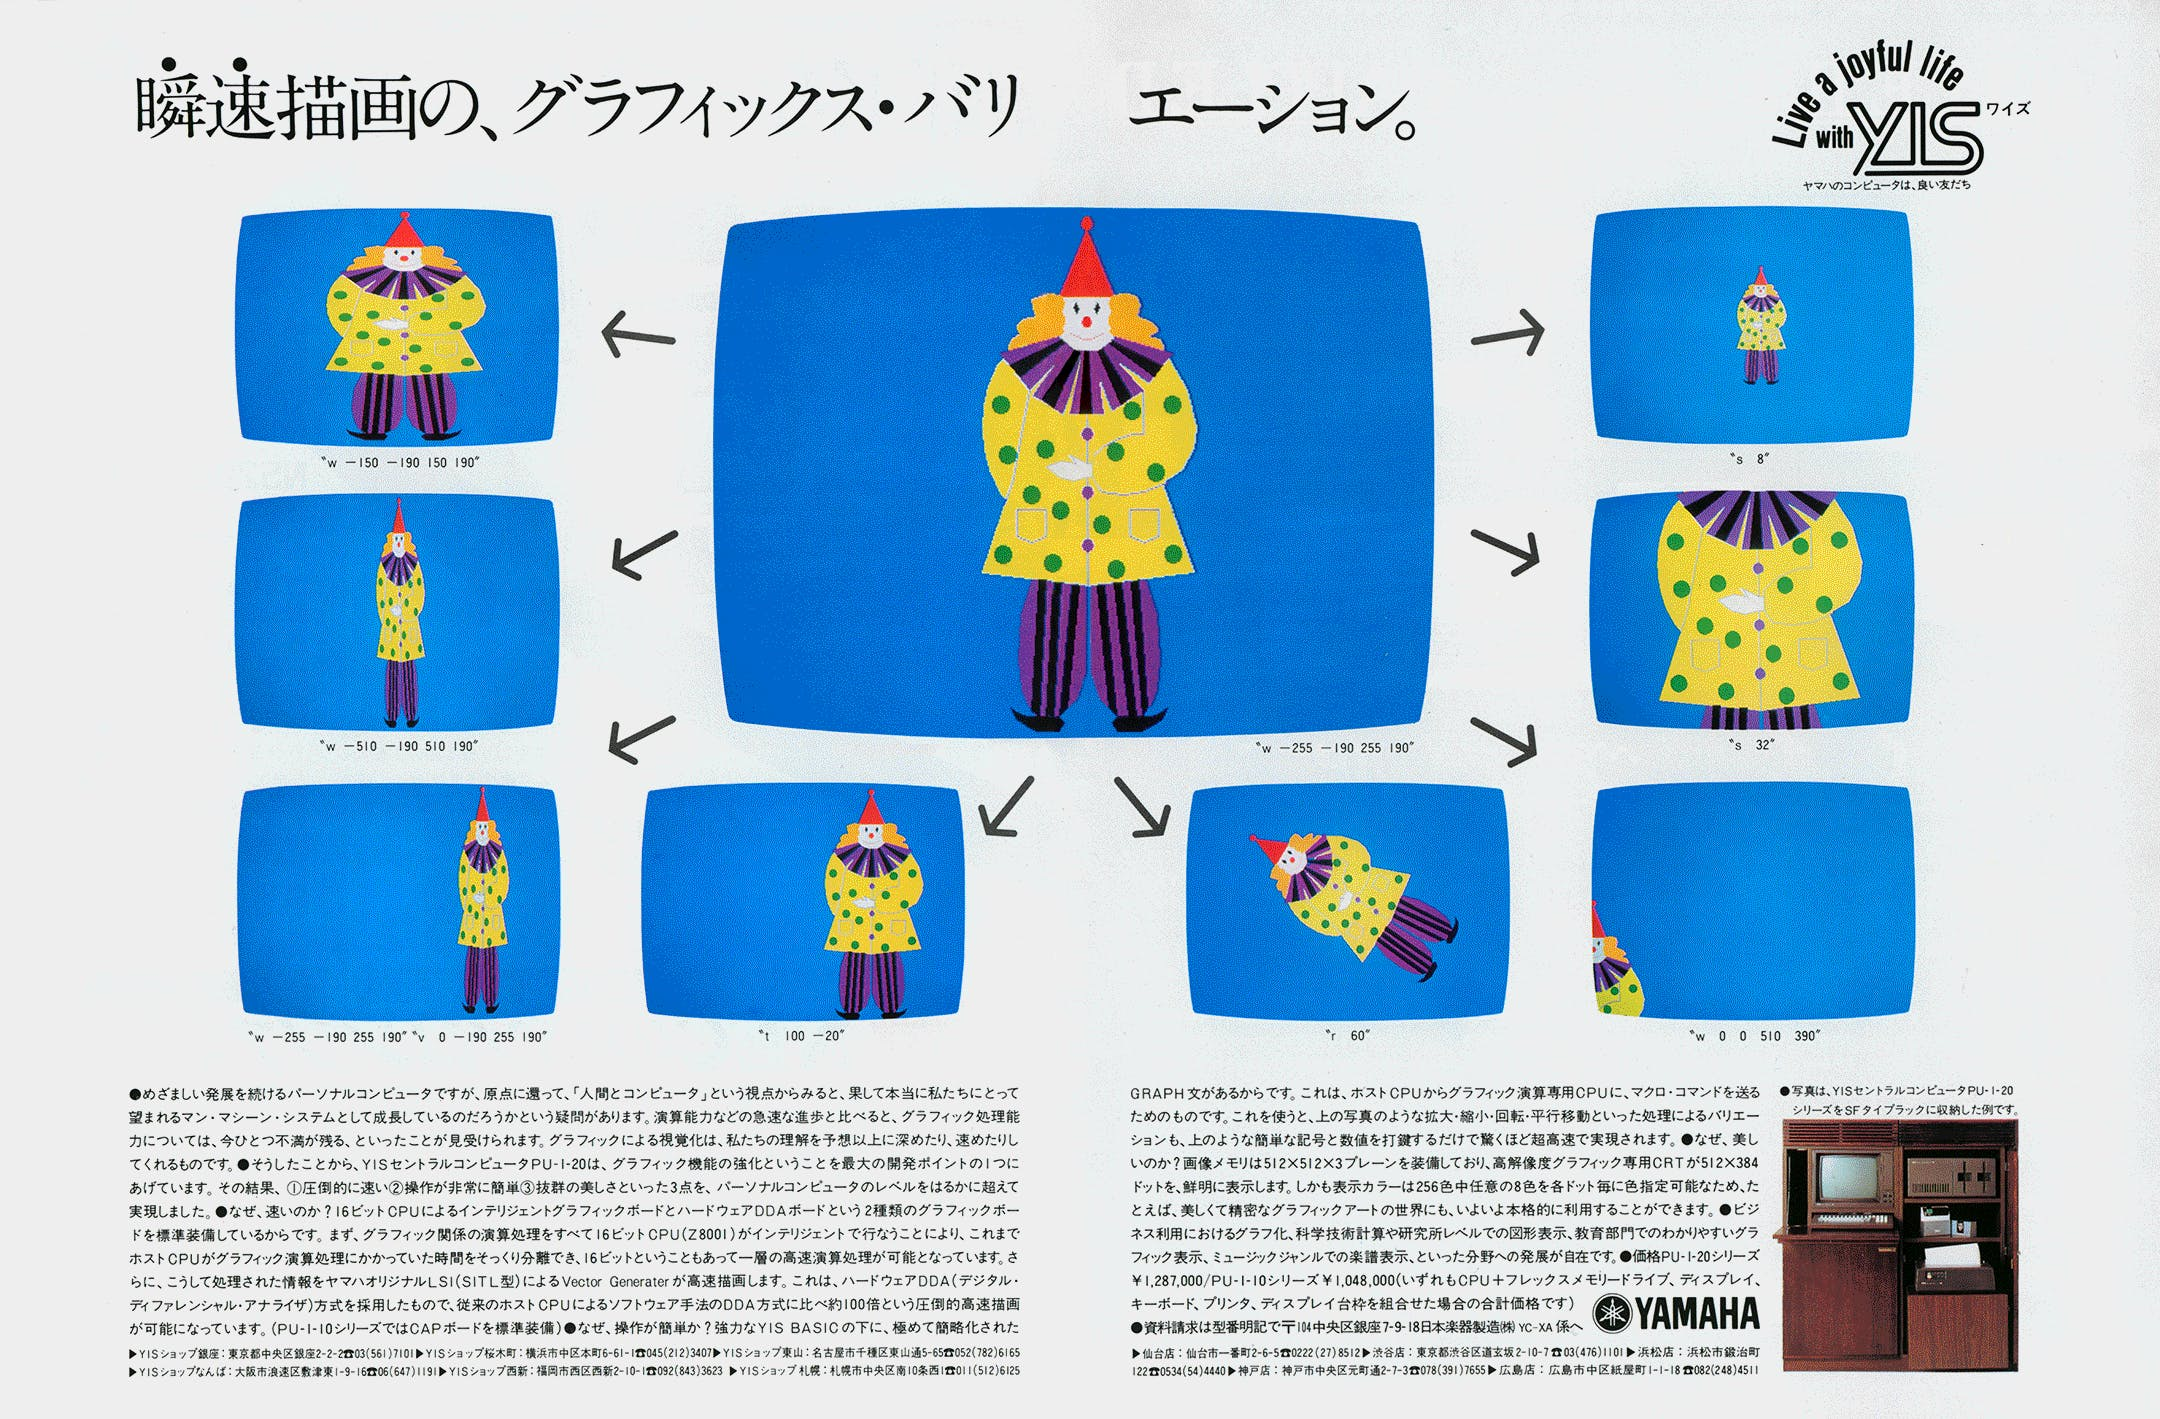 Yamaha YIS advertisement ASCII japan 8 1982